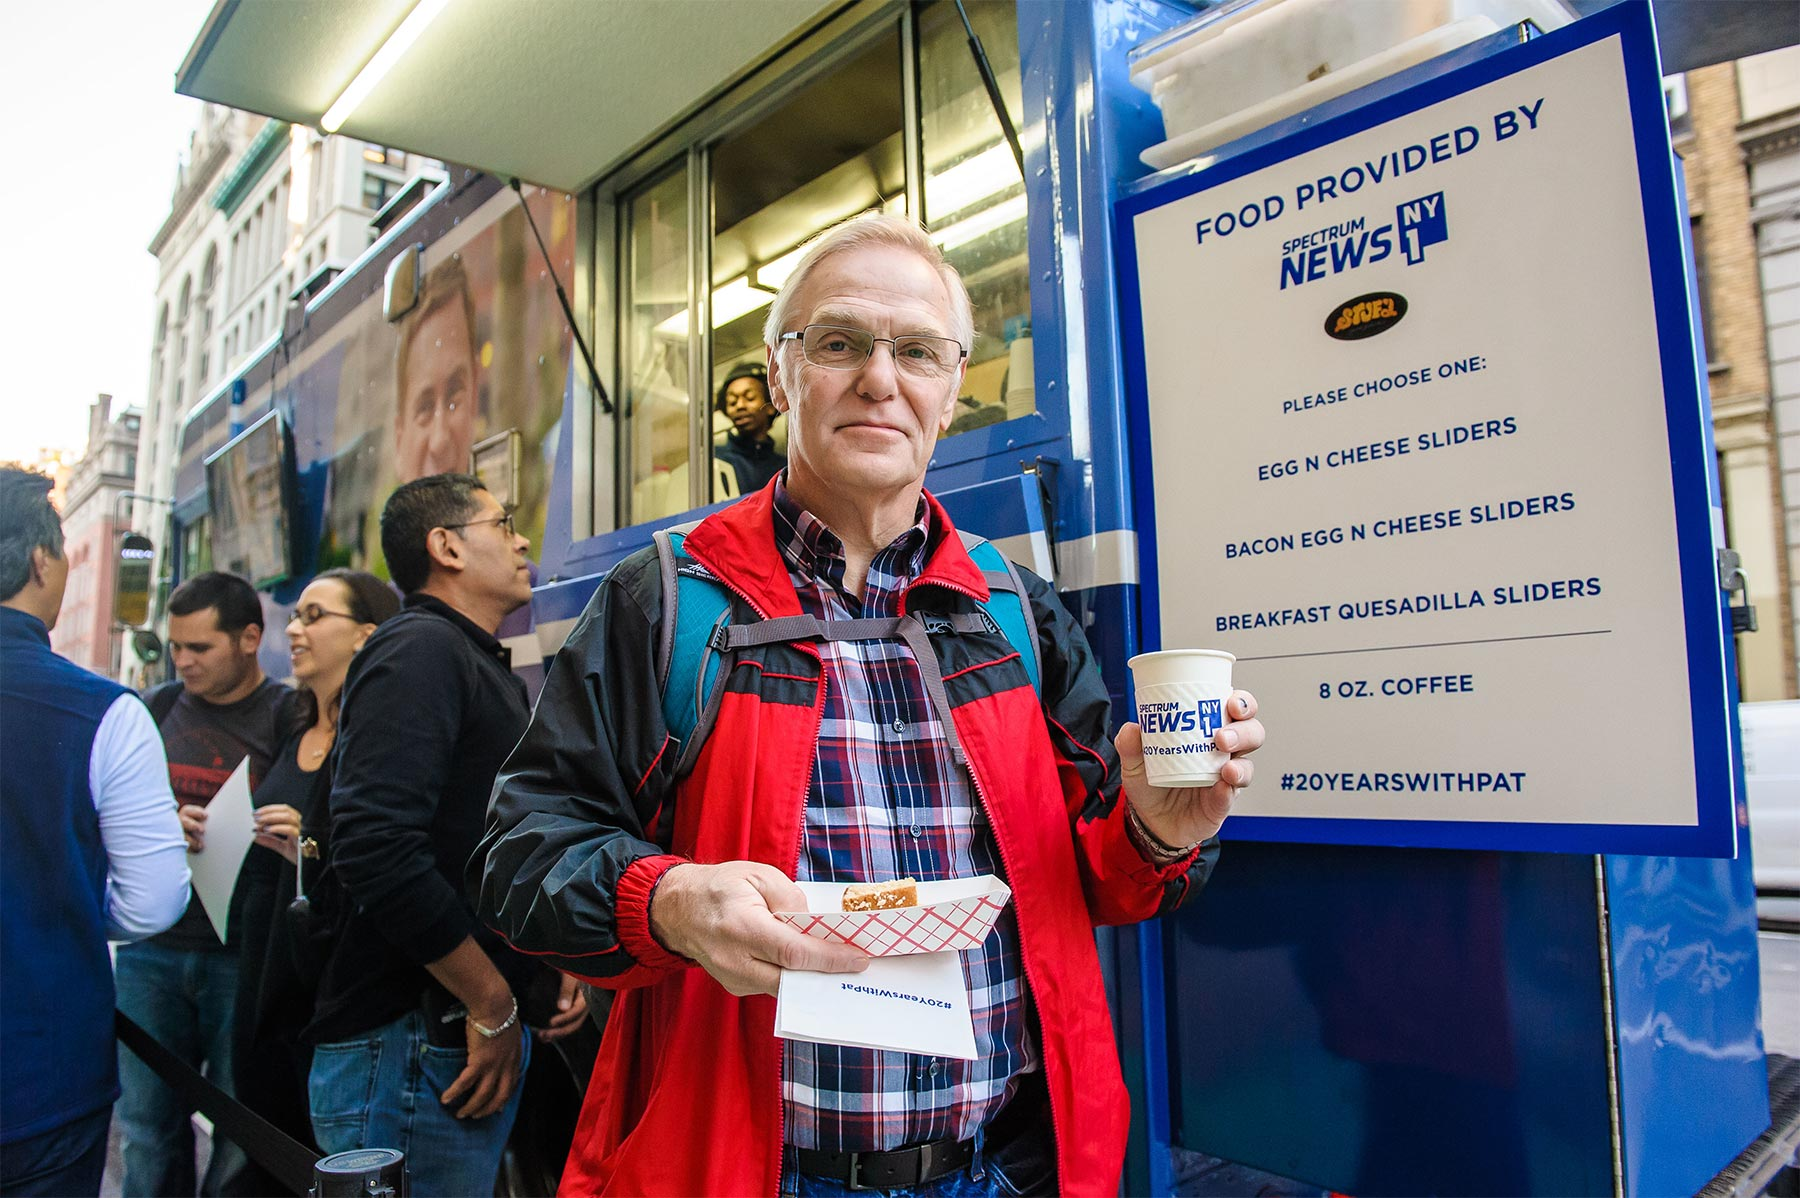 Ny anniversary food truck u the michael alan group